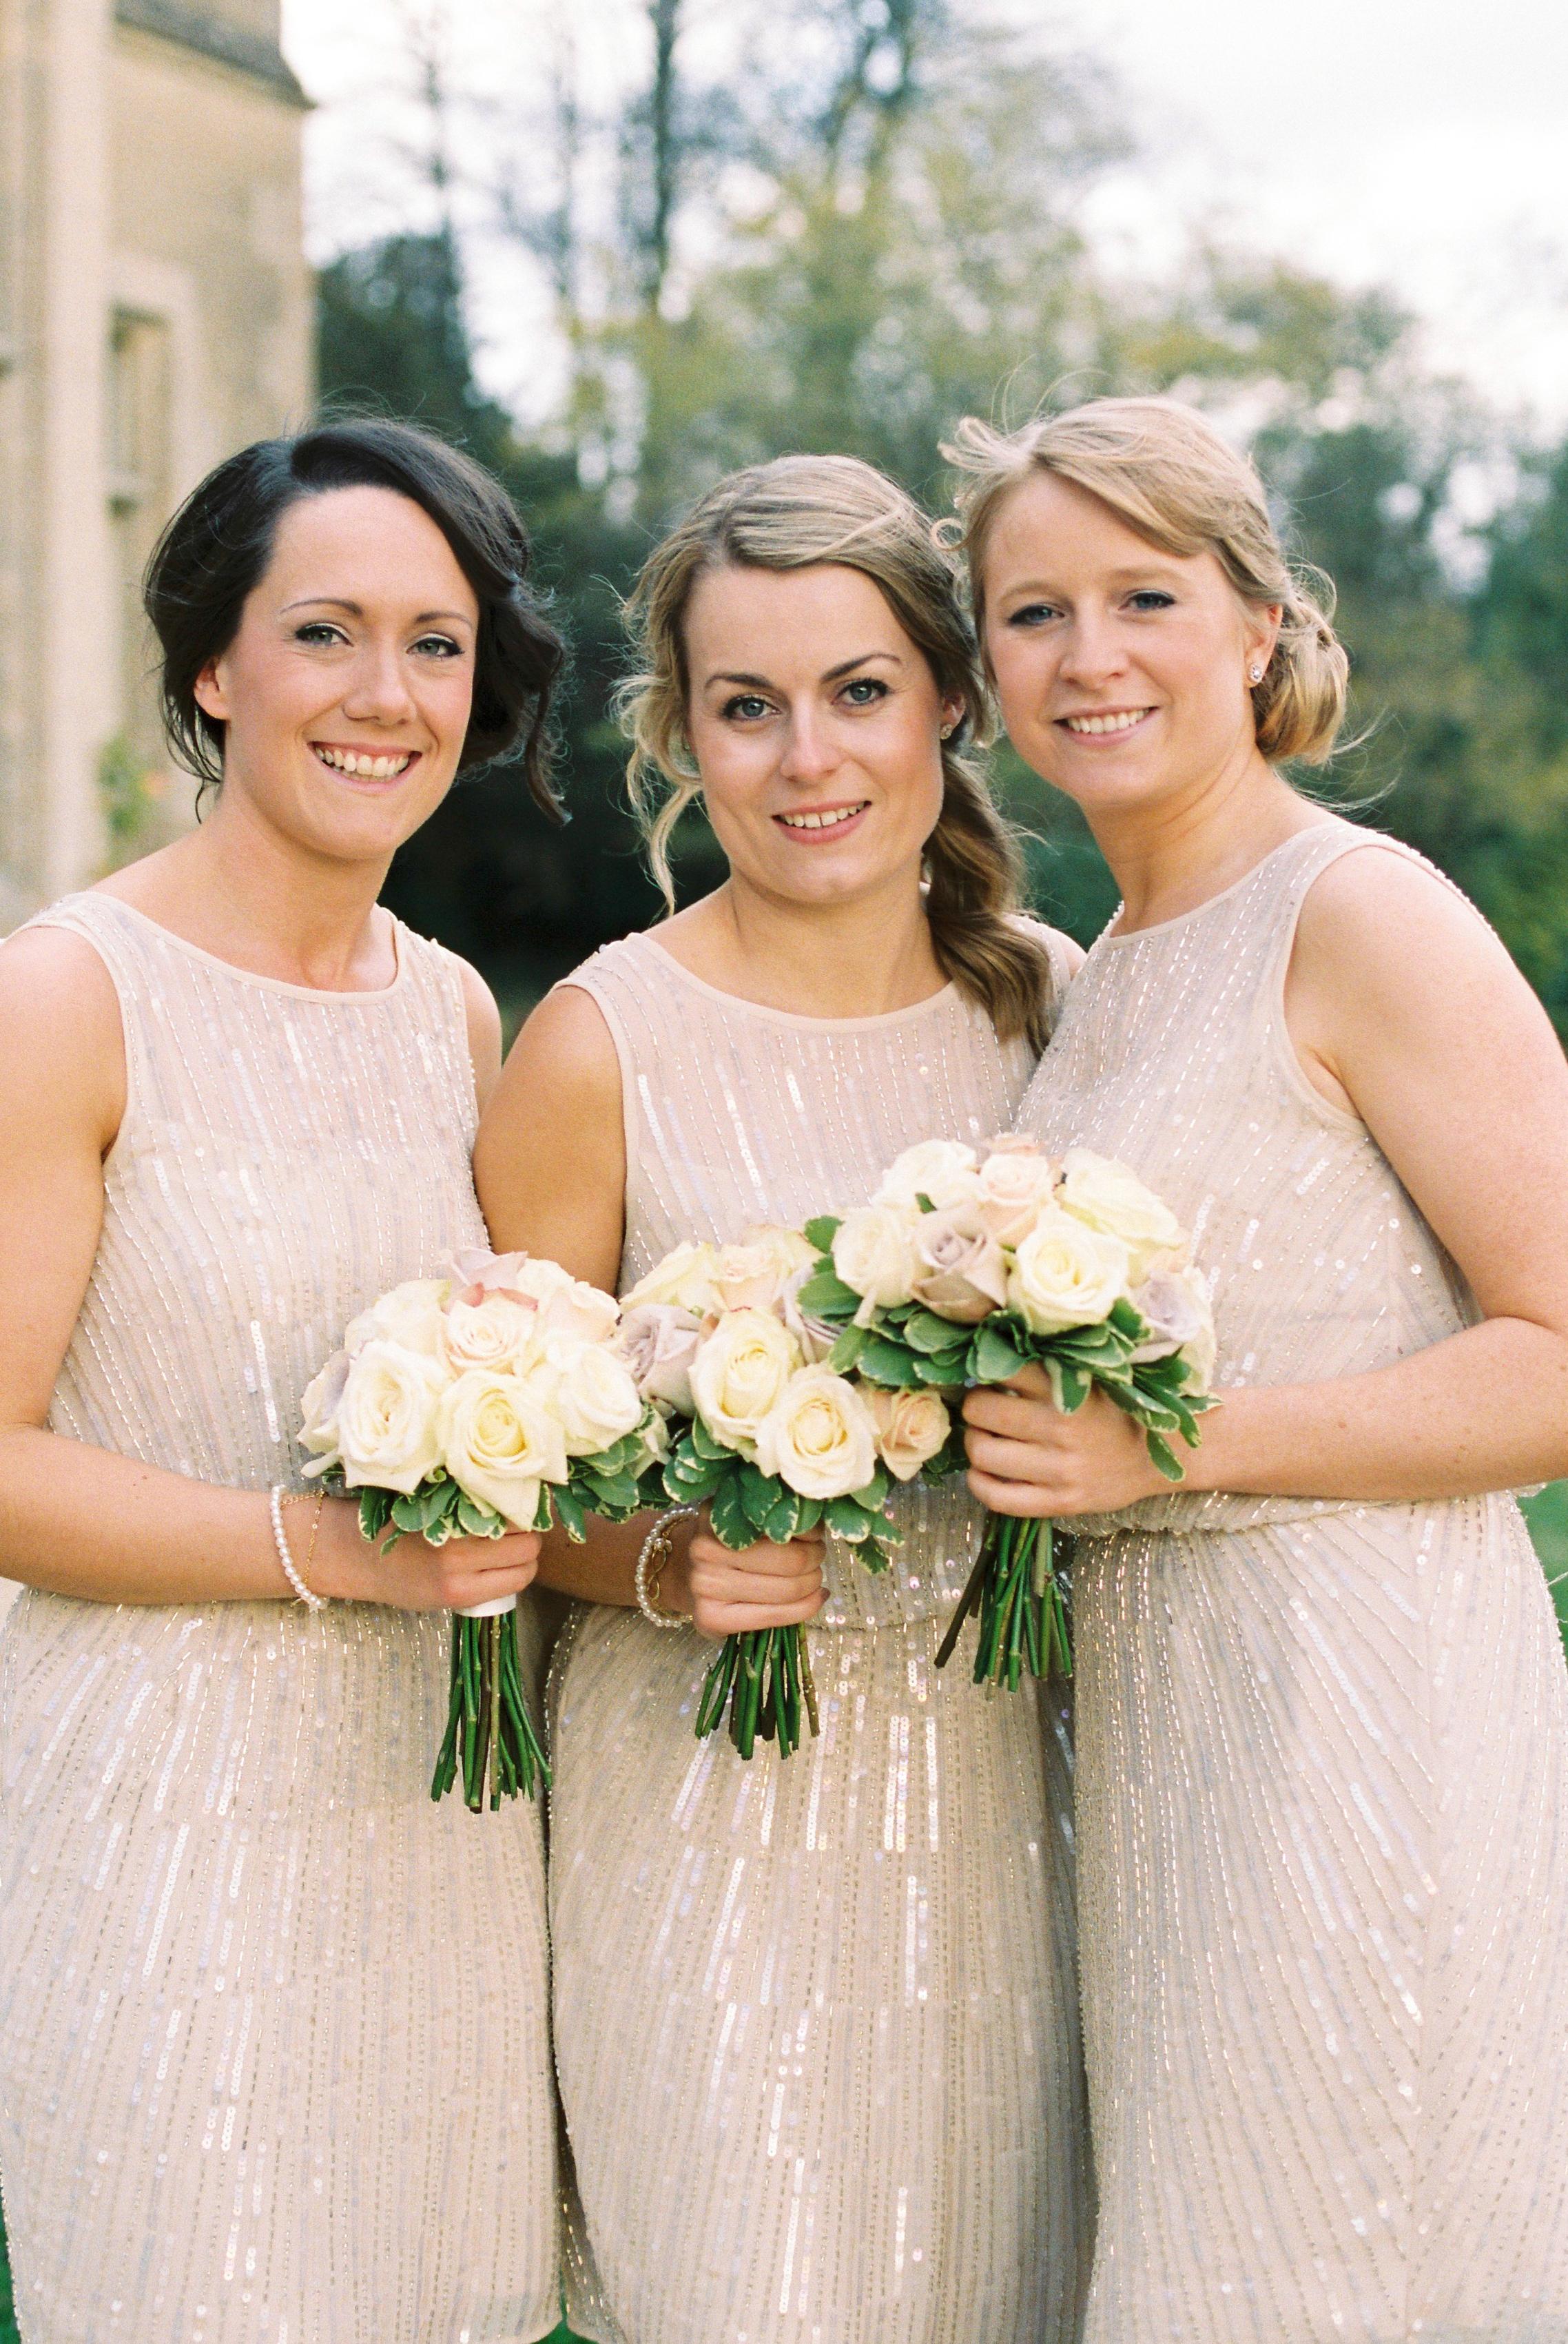 england_wedding_(c)_rory_wylie-3.jpg